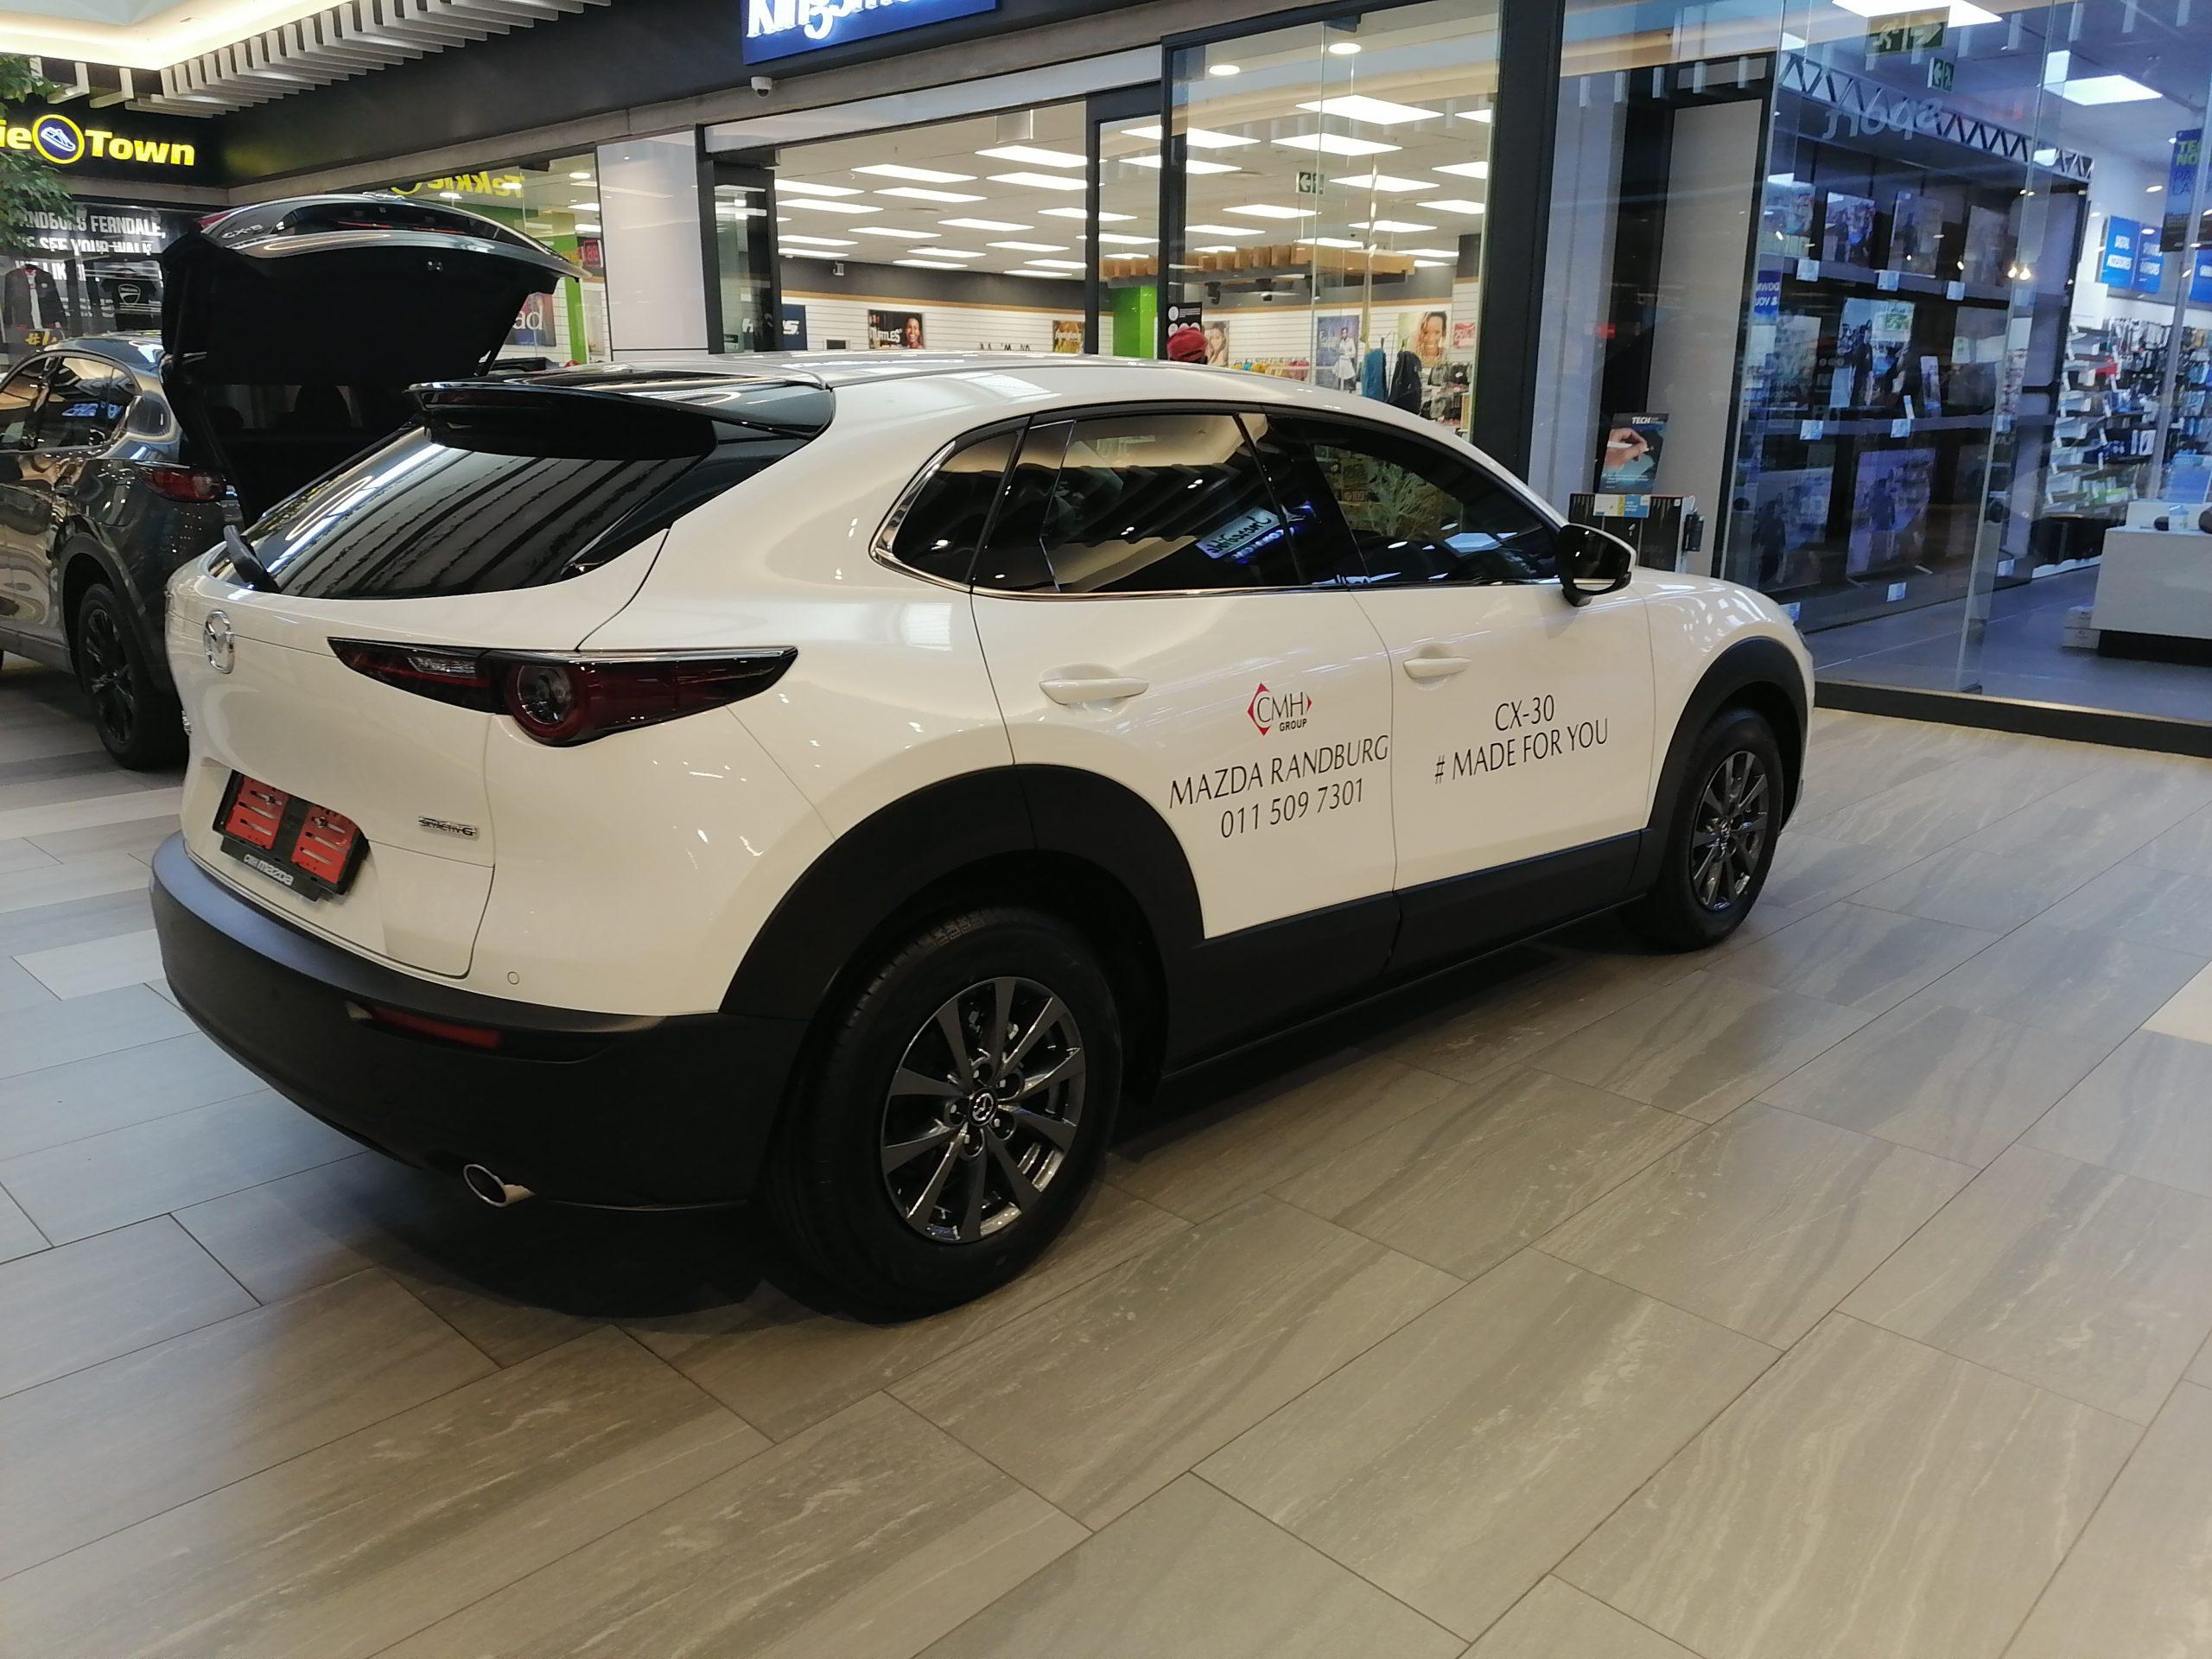 Mazda CX-30 Mall Display